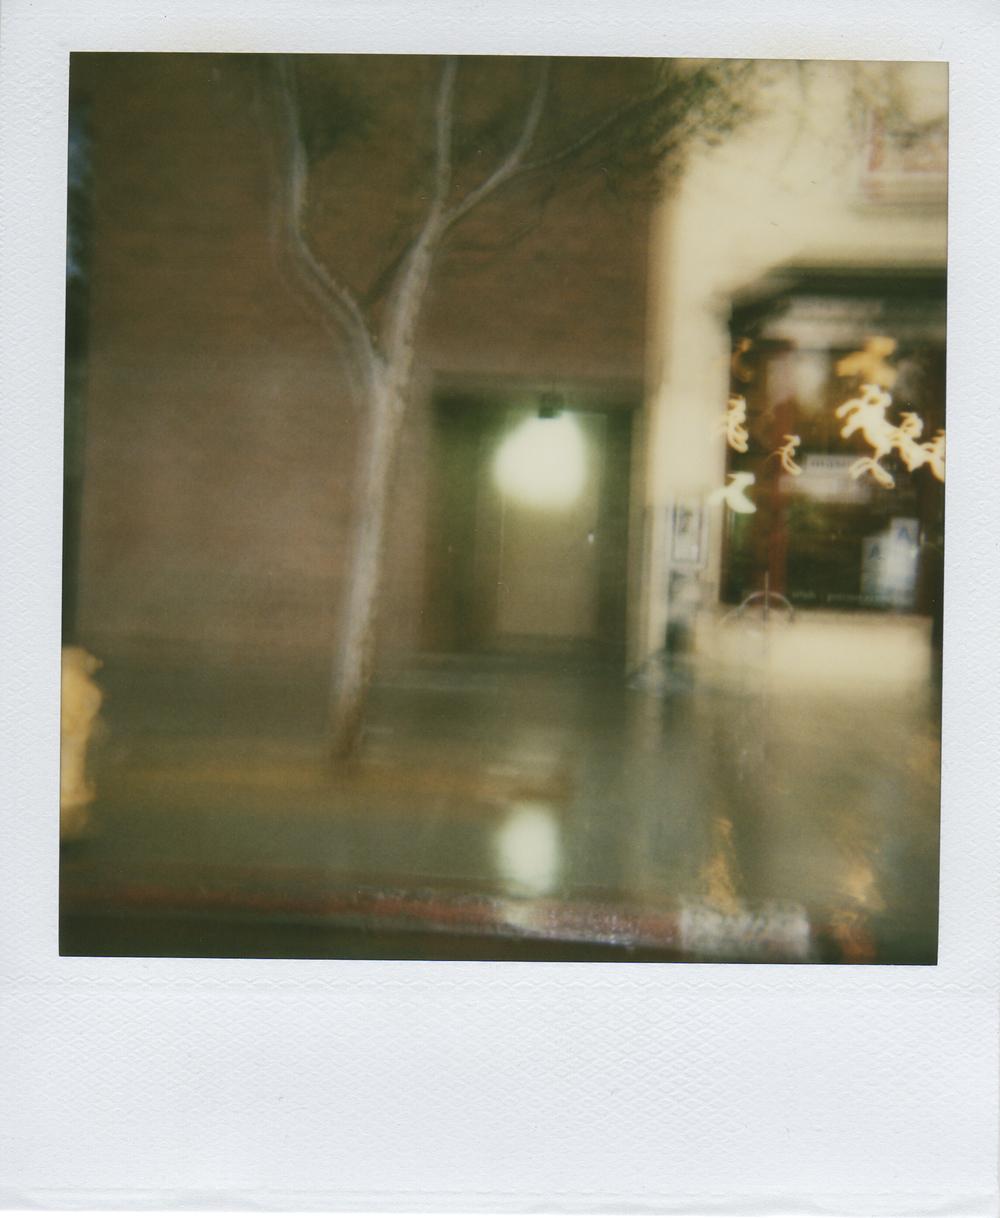 jlaurence-polaroid-134.jpg